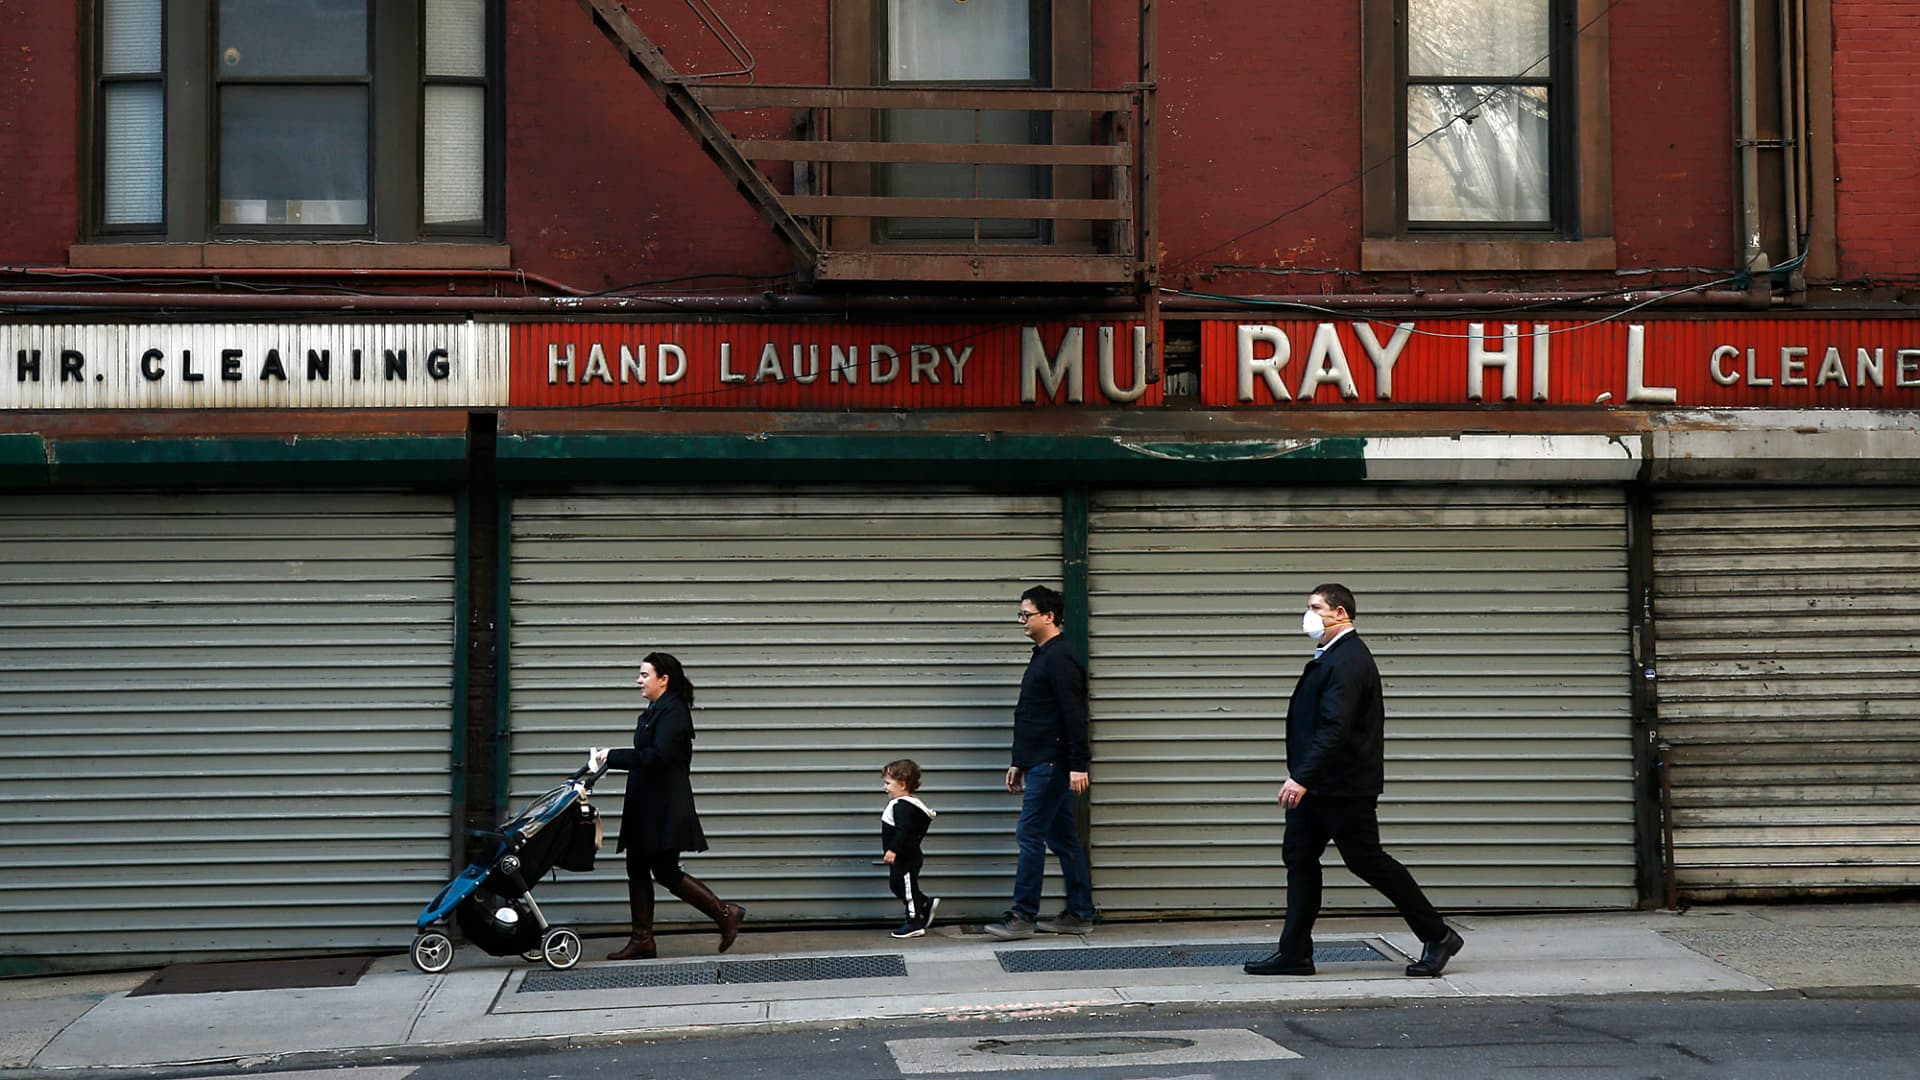 Pedestrians walk past closed shops along Lexington Avenue amid the coronavirus pandemic on April 7, 2020 in New York City.